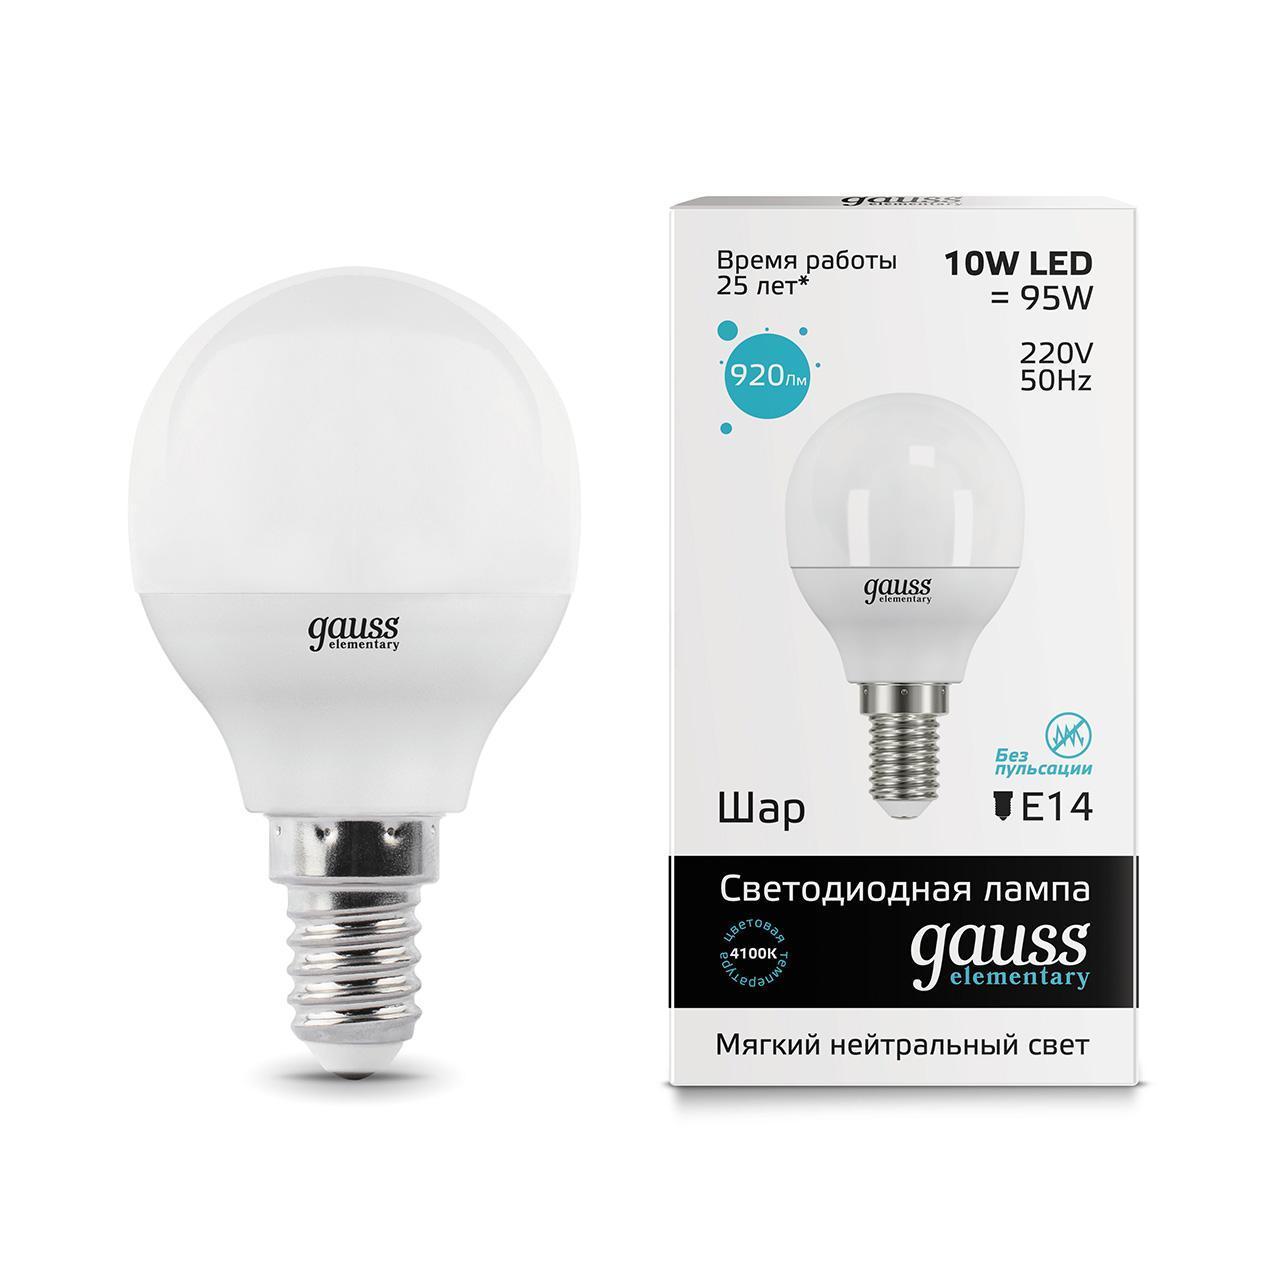 Лампа светодиодная E14 10W 4100K матовая 53120 gauss лампа светодиодная gauss шар матовый e14 10w 4100k 53120